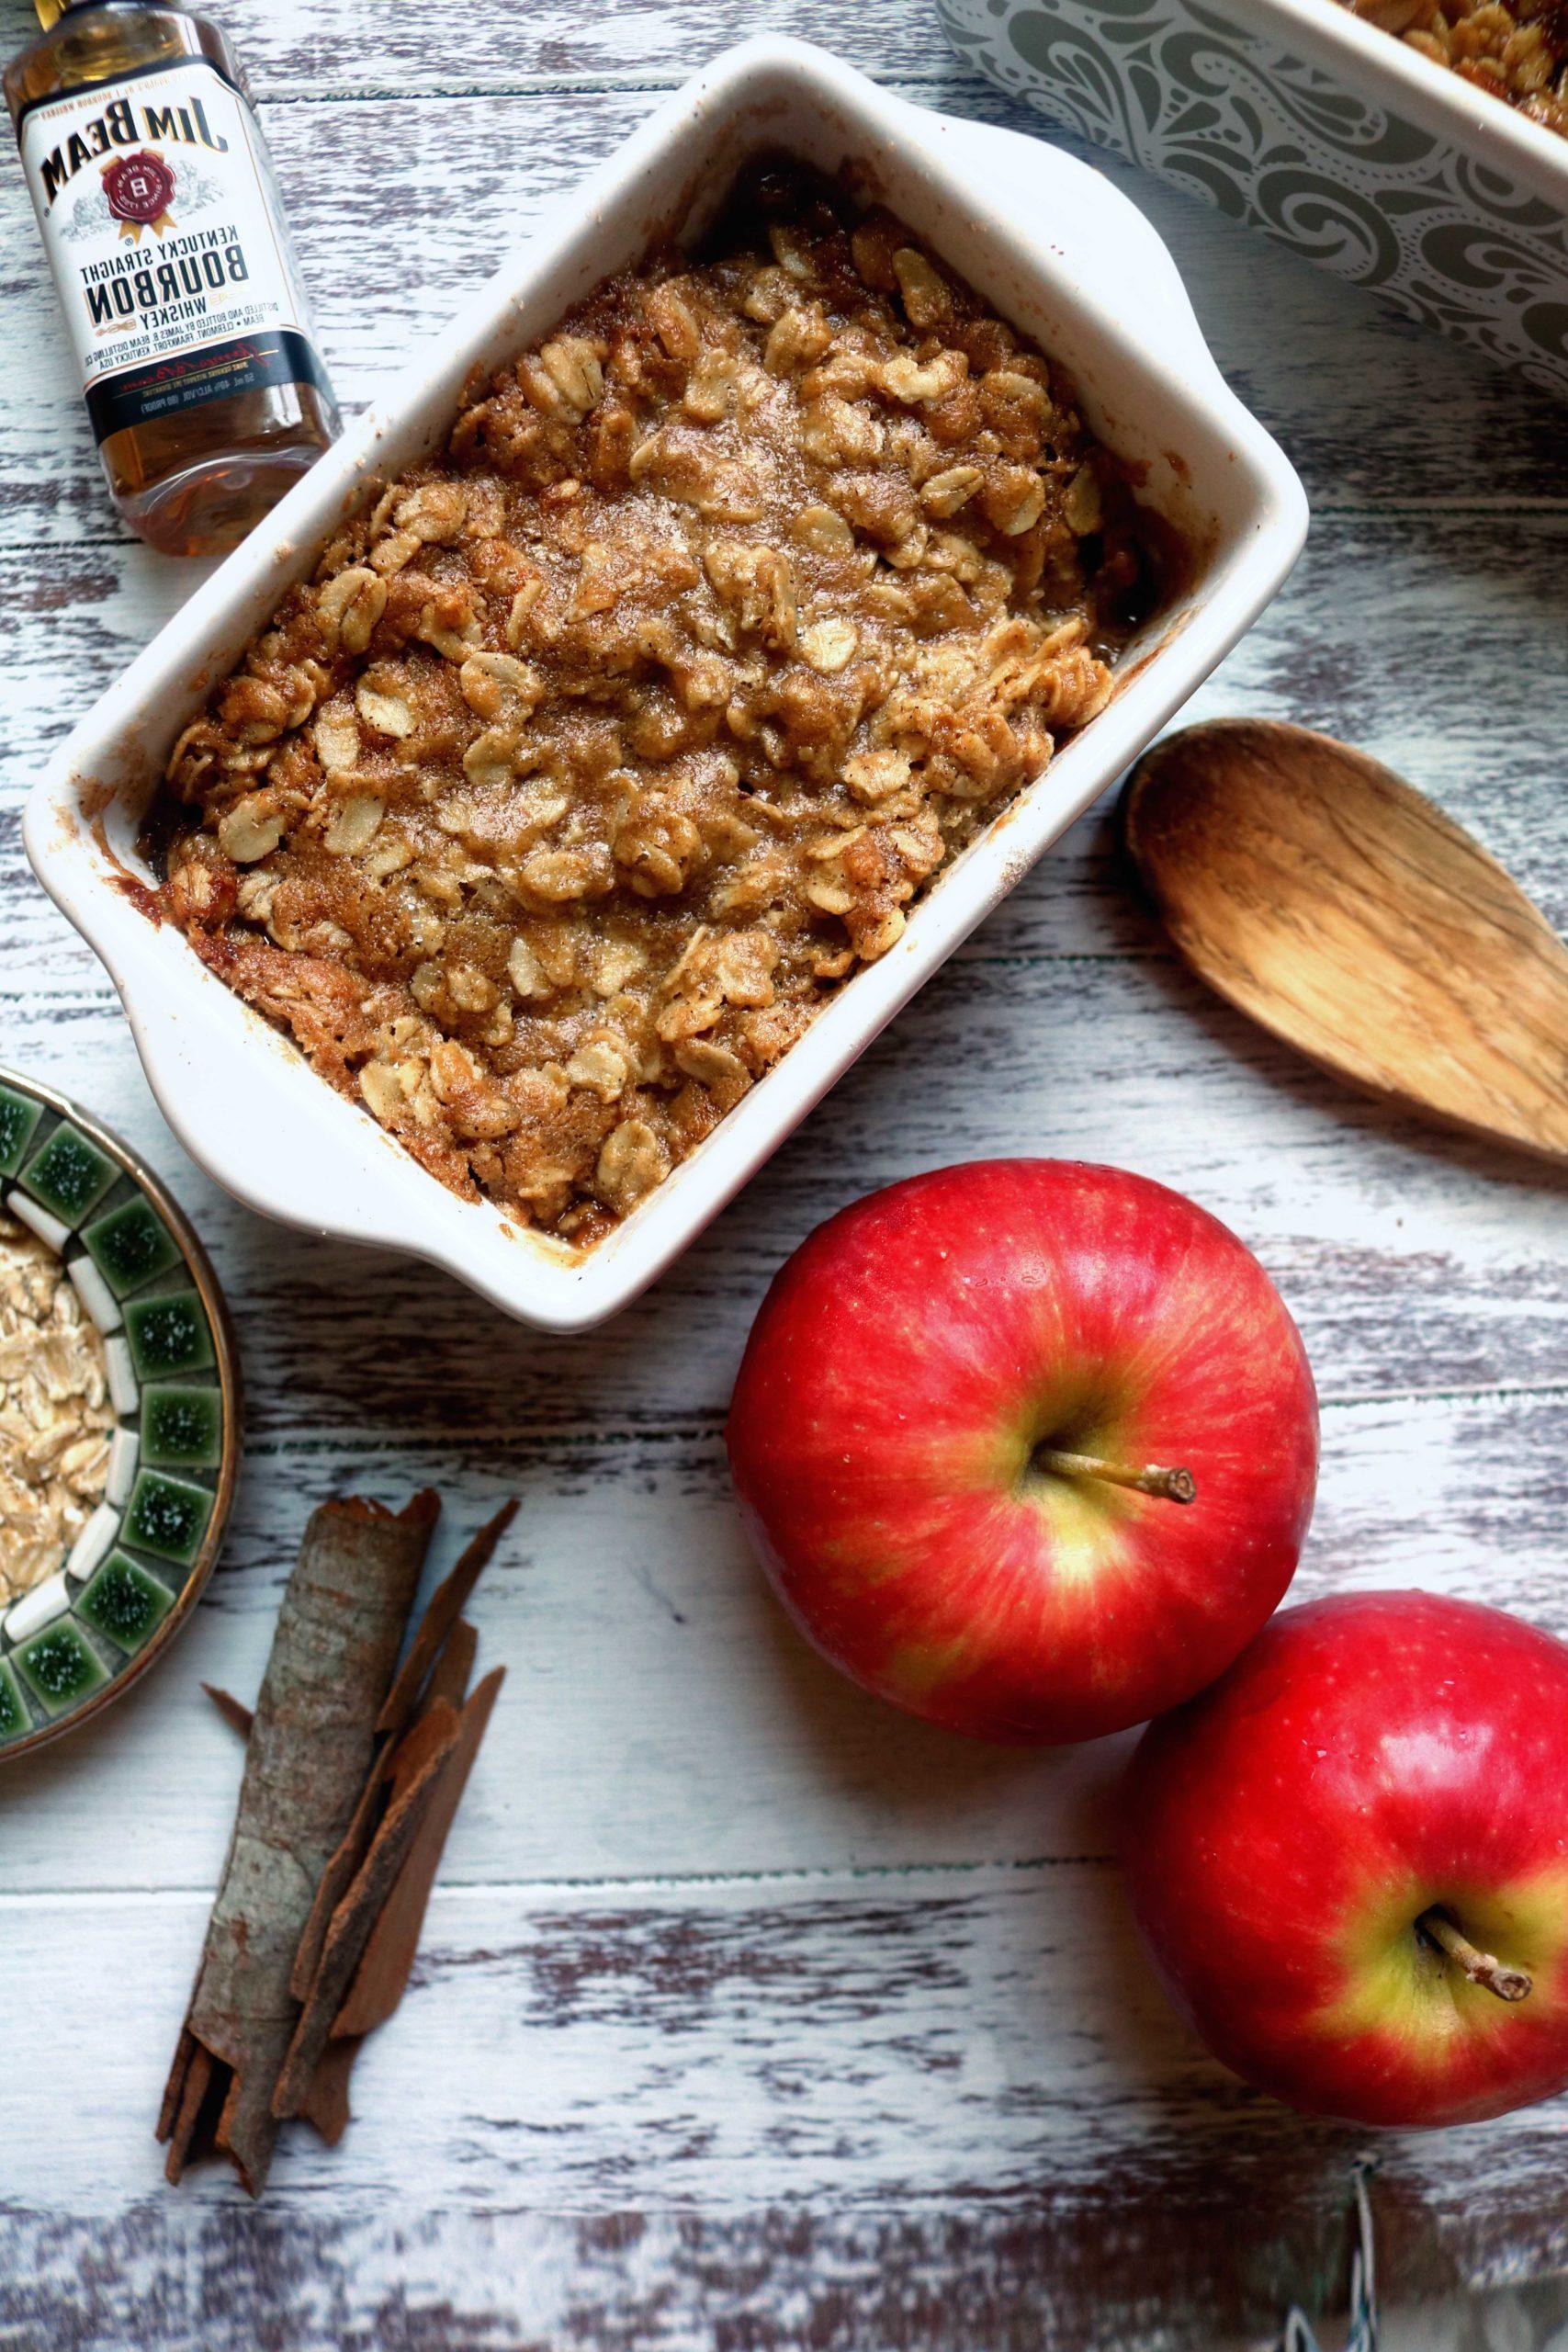 Bourbon apple crisp recipe for Mabon, the Fall Equinox or Thanksgiving.